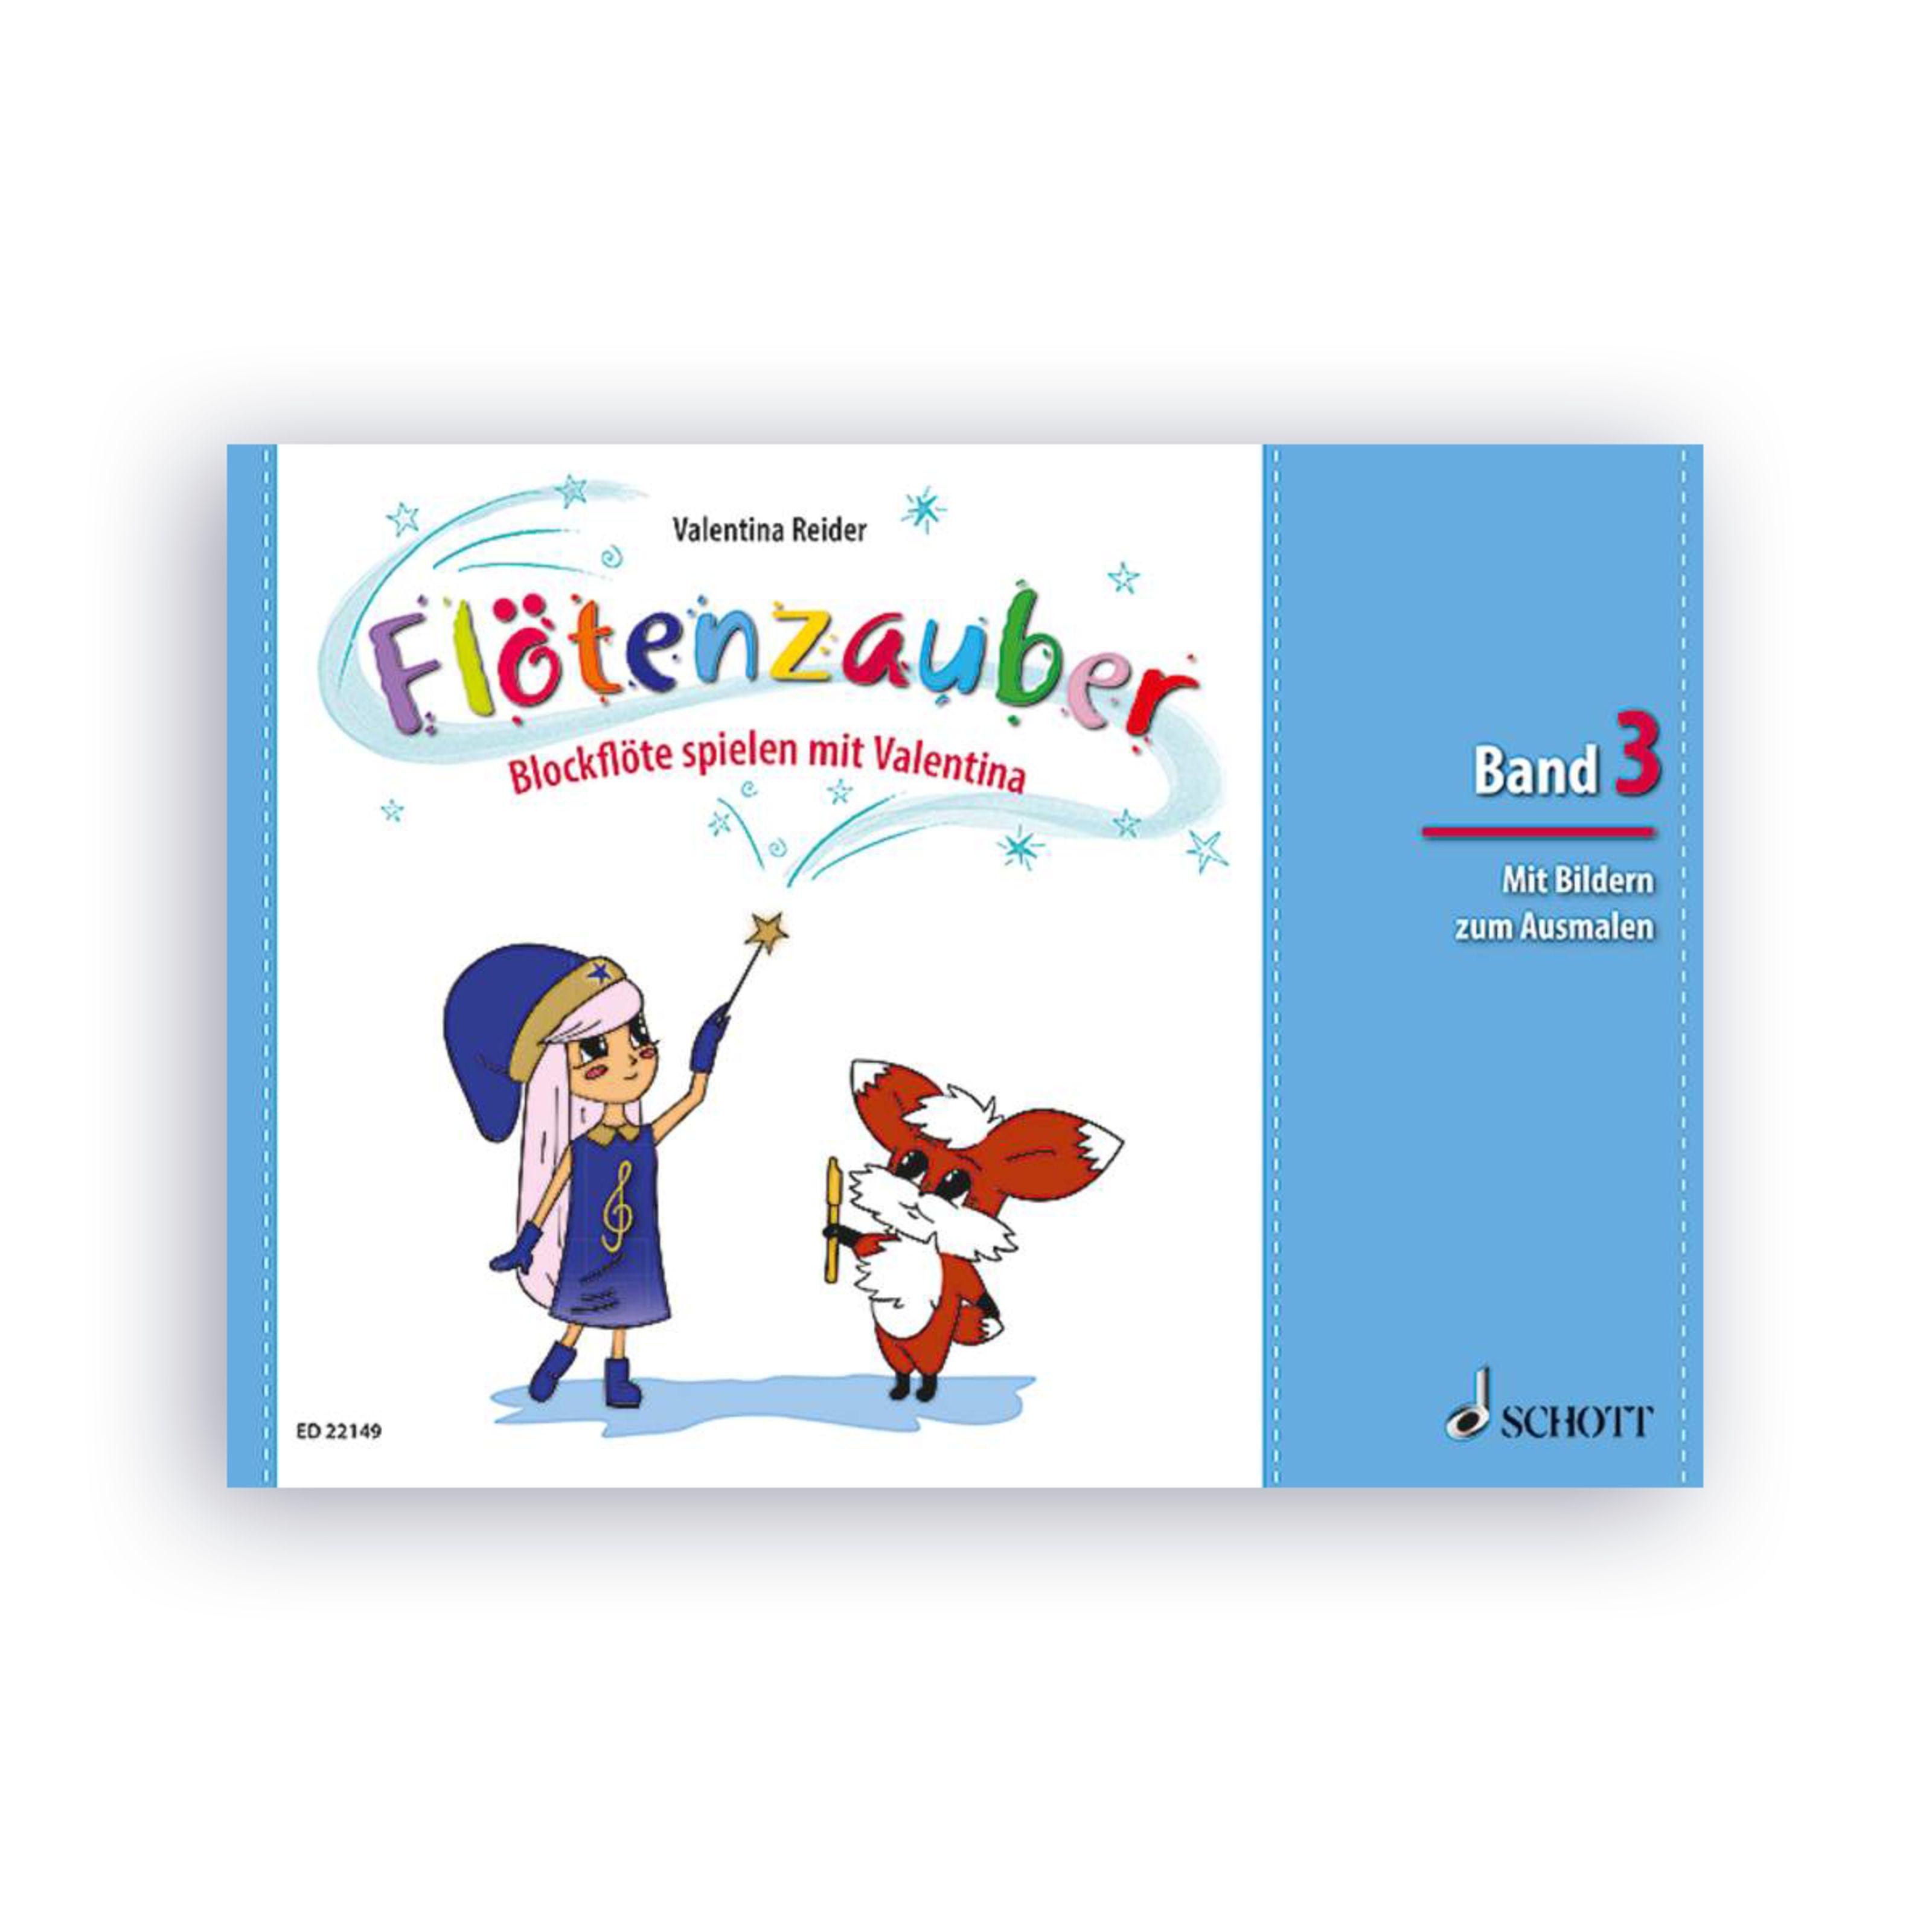 Schott Music - Flötenzauber 3 ED 22149